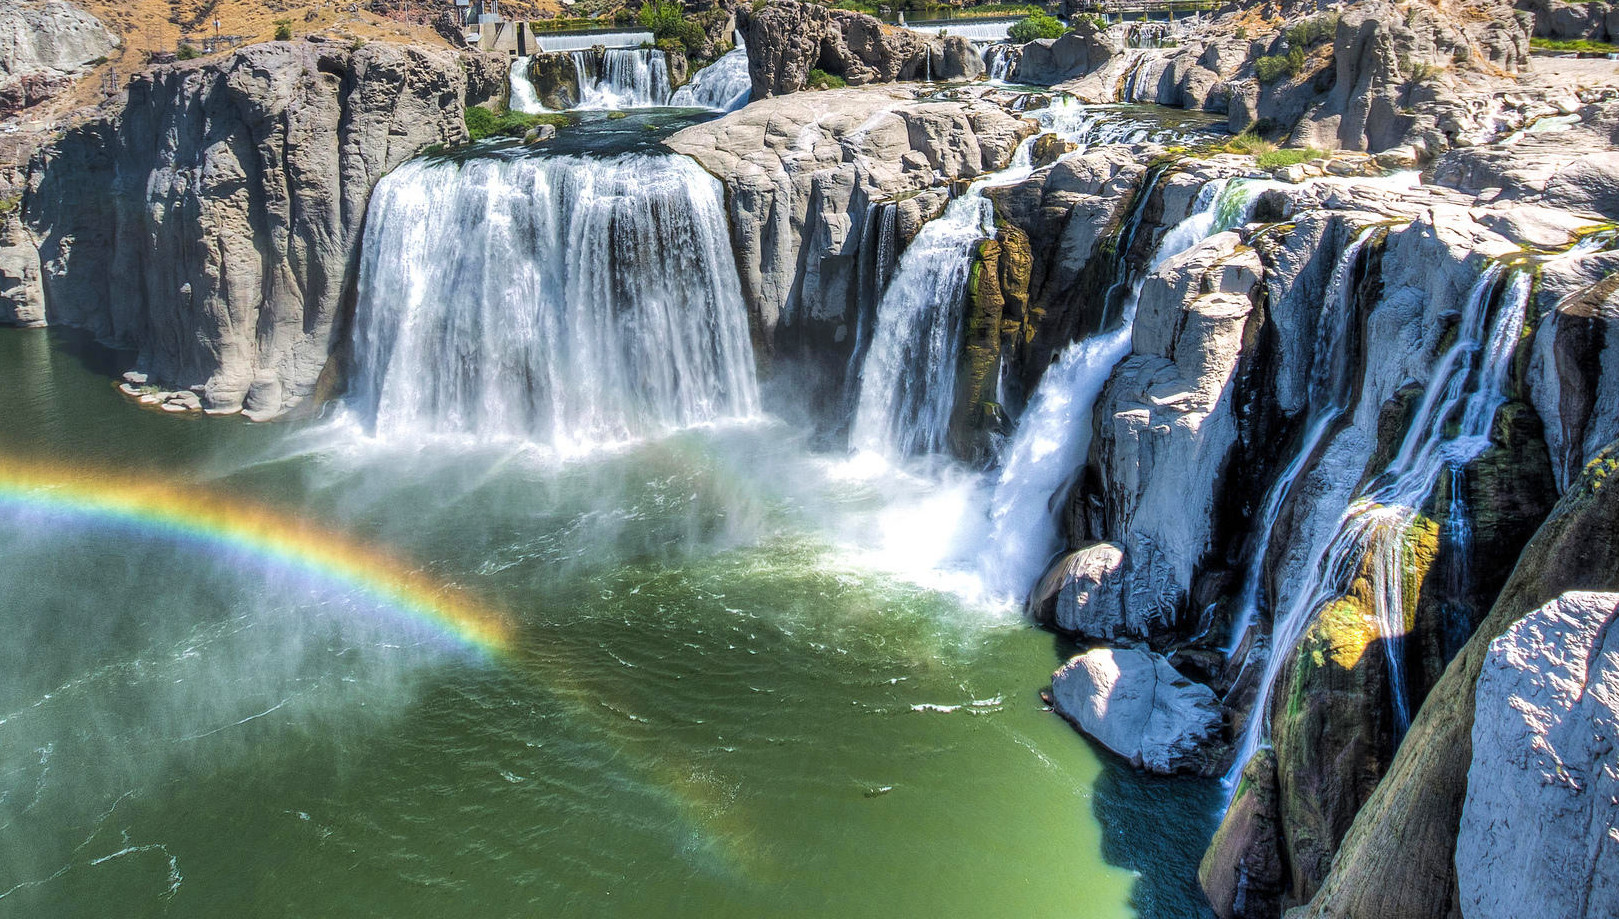 ShoshoneFalls MagicValley Waterfall